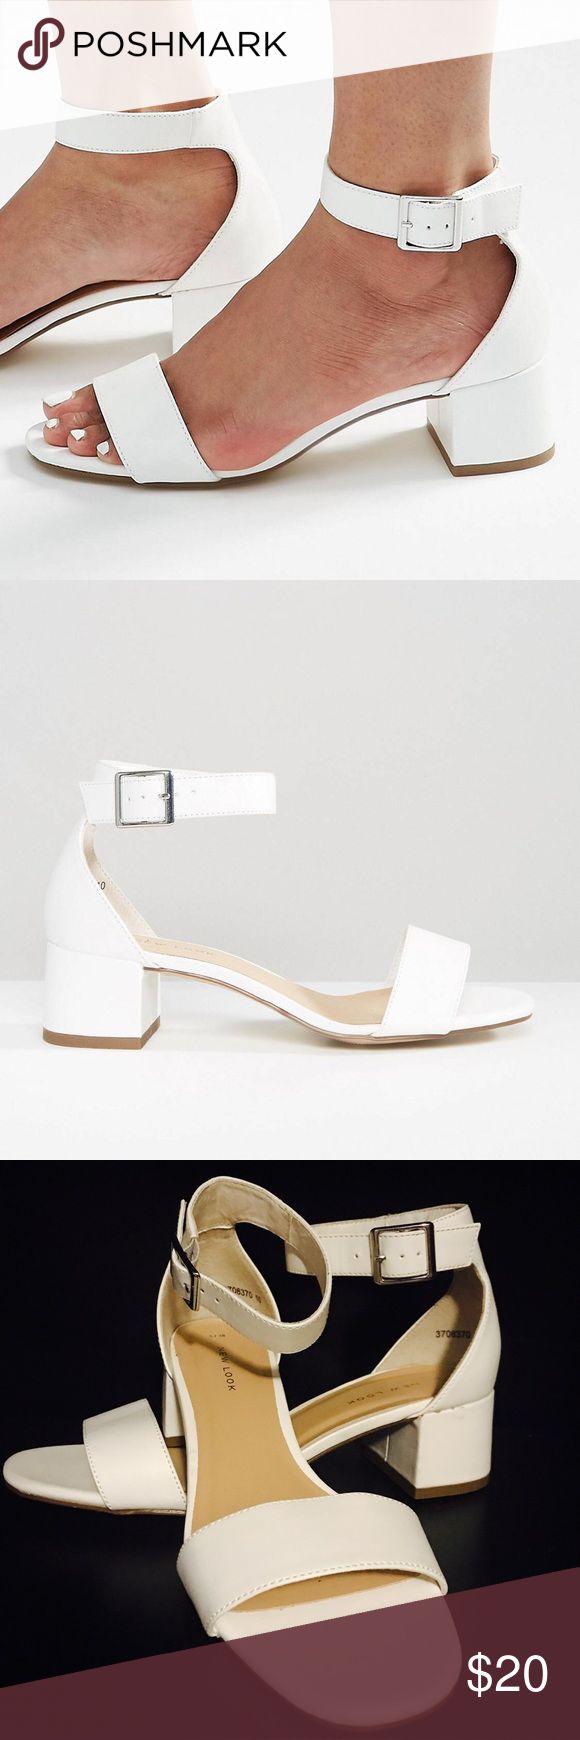 New Look Block Heel Sandal Worn once! ✨ Size US 7 / UK 5. New Look Shoes Sandals